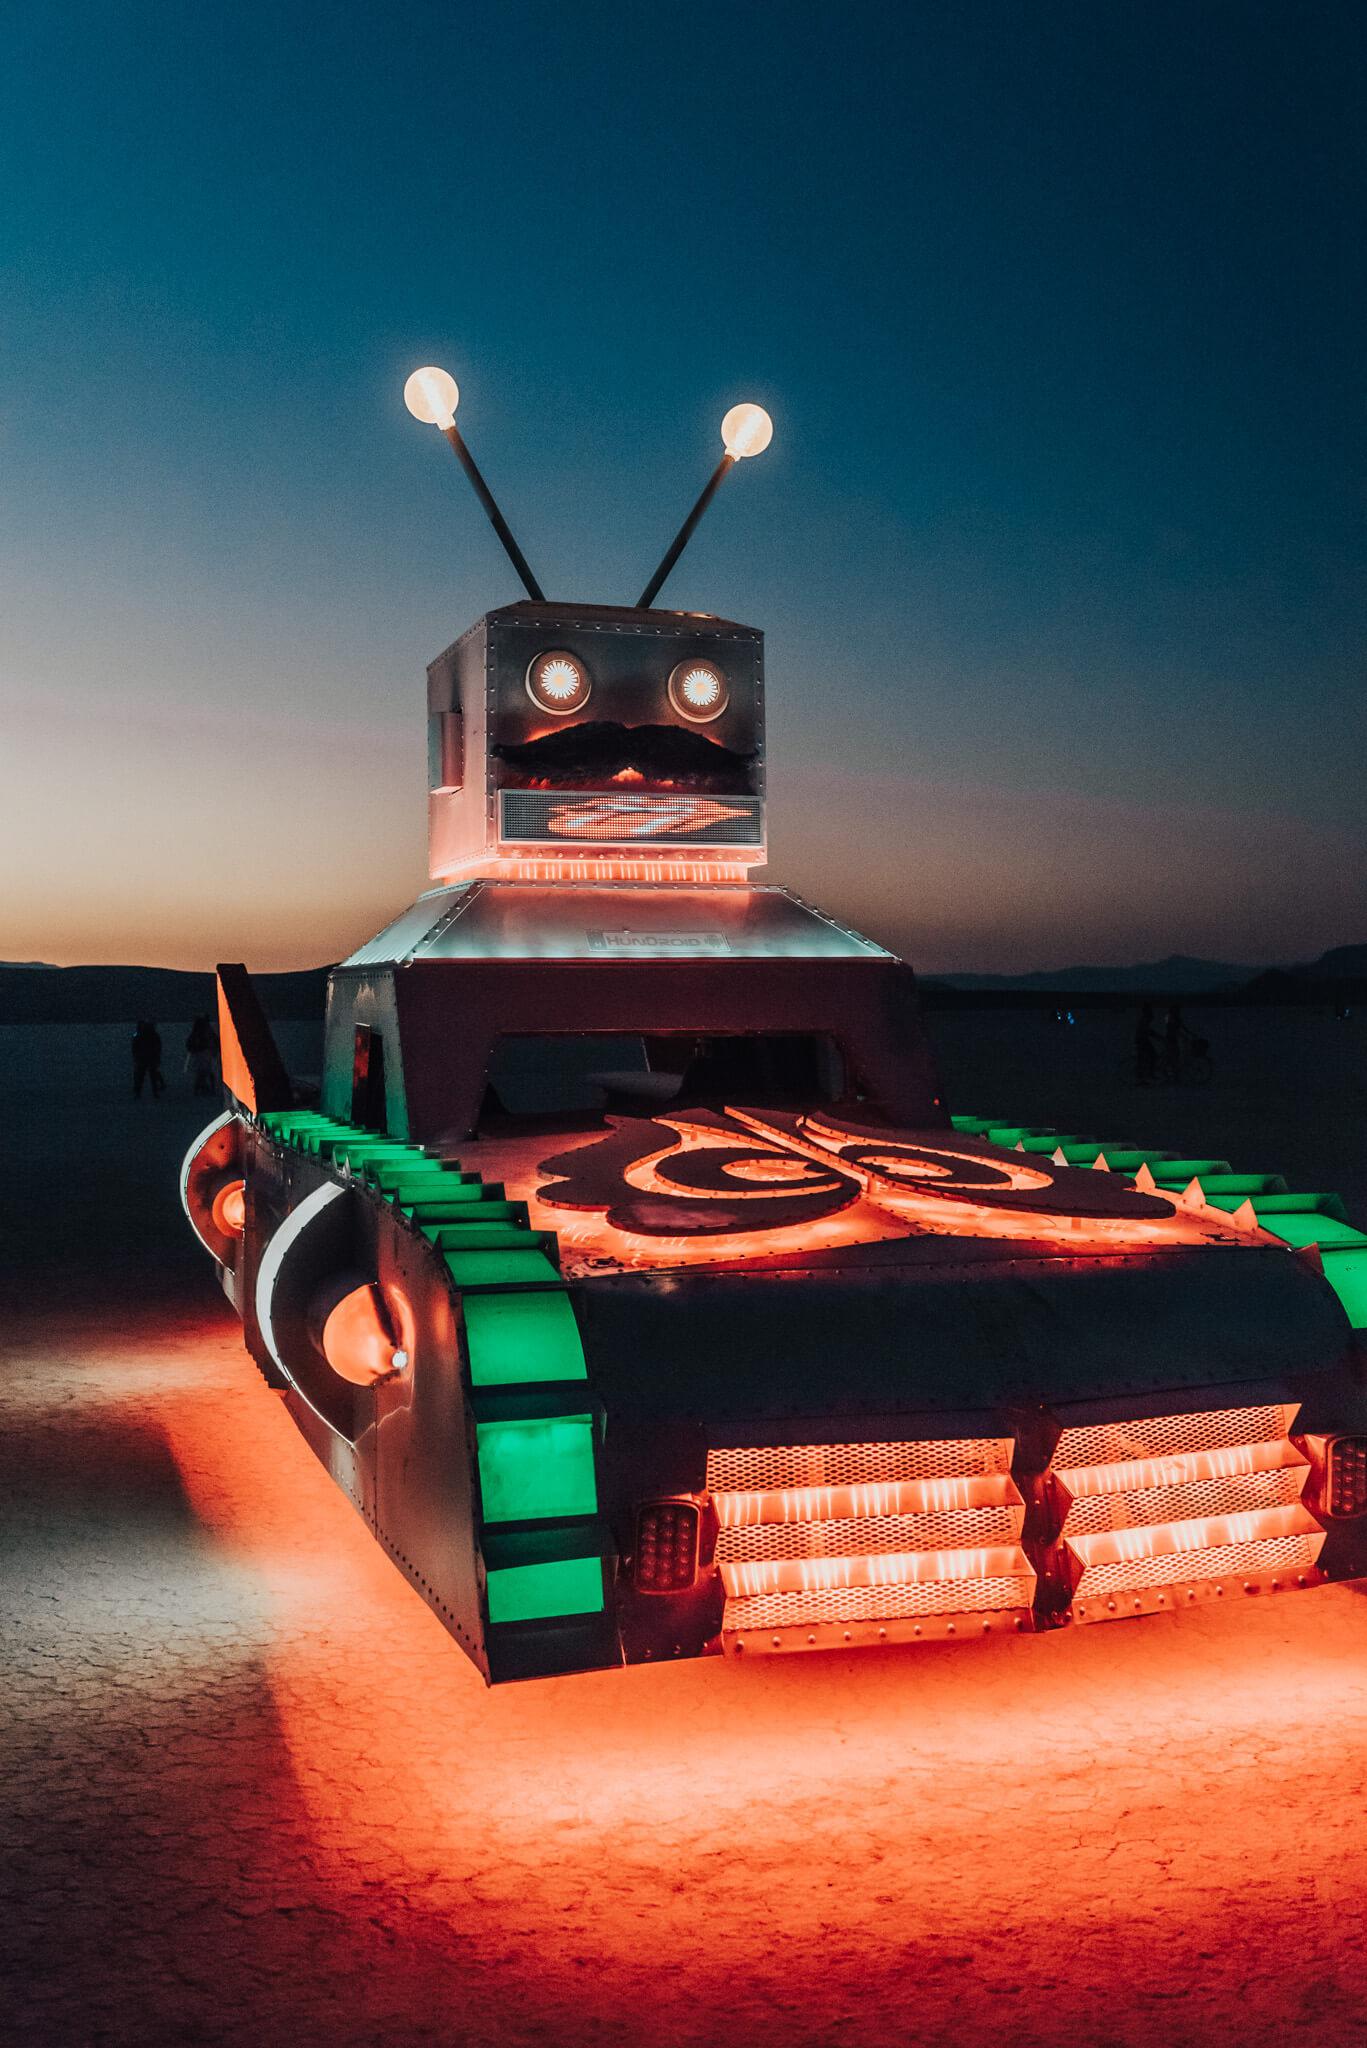 robot car burning man 2018